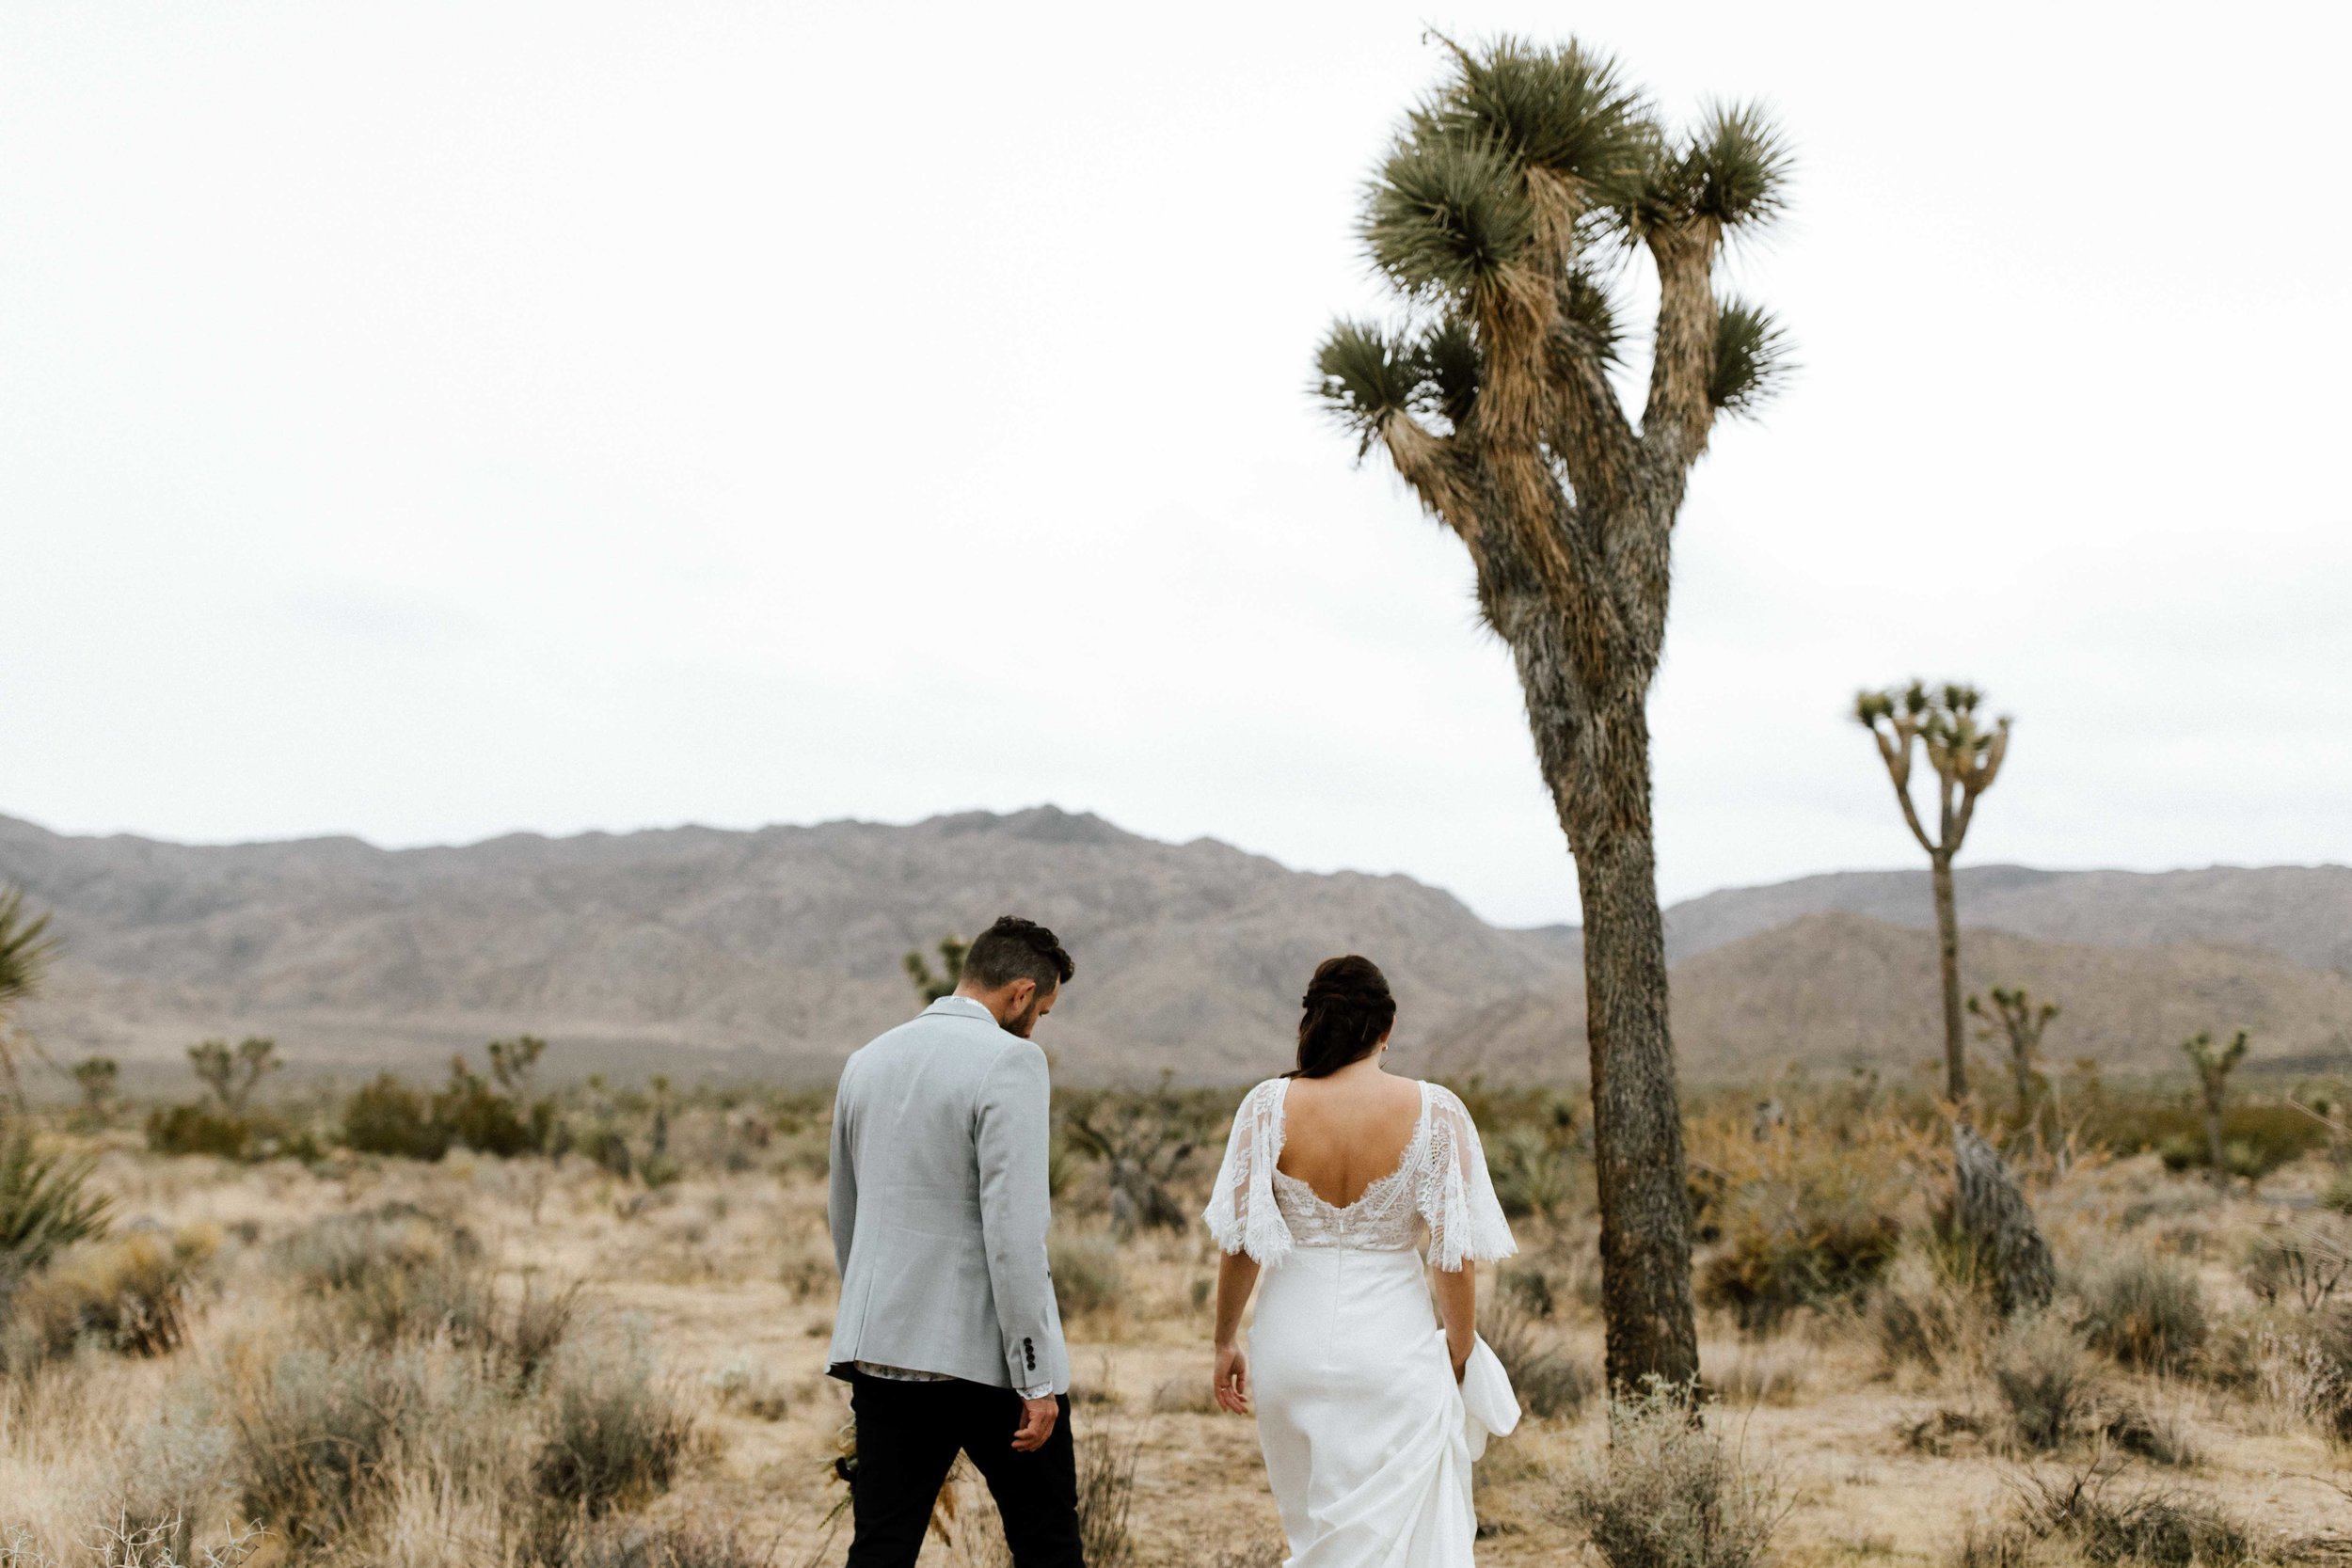 America Joshua Tree Palm Springs Elopement wedding-44.jpg